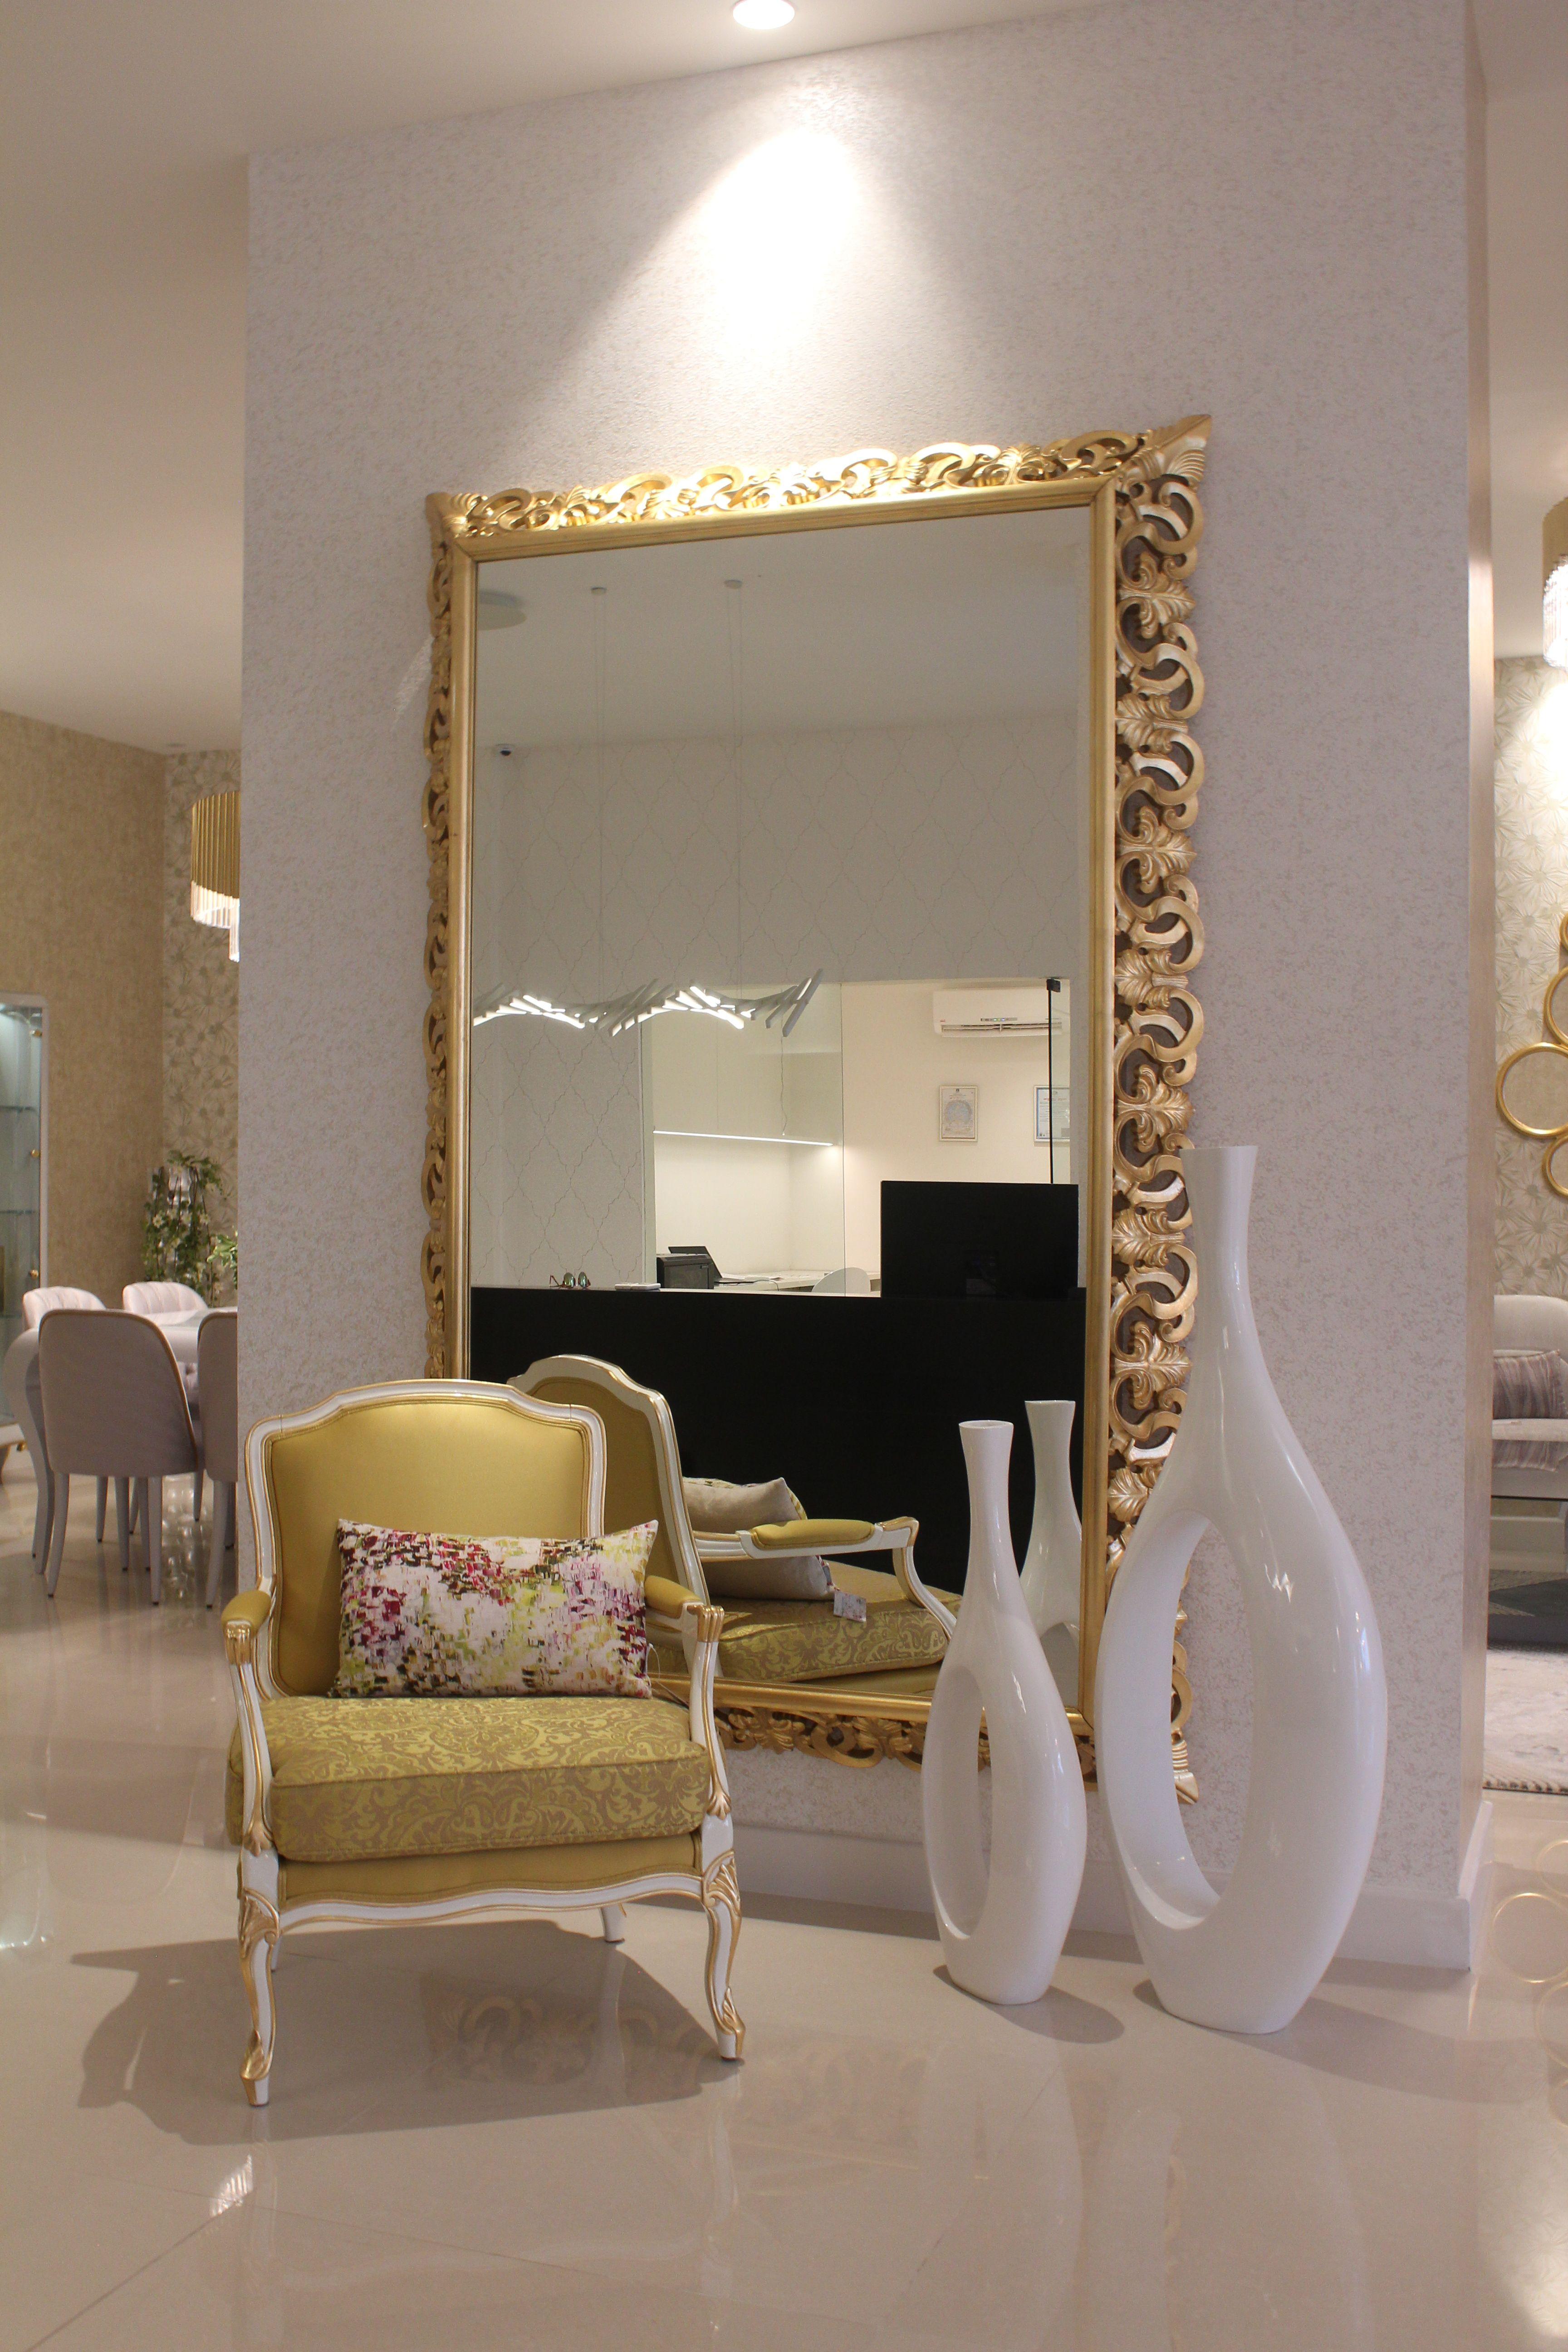 Mobili rio moderno furniture decor home furniture for Moderno furniture